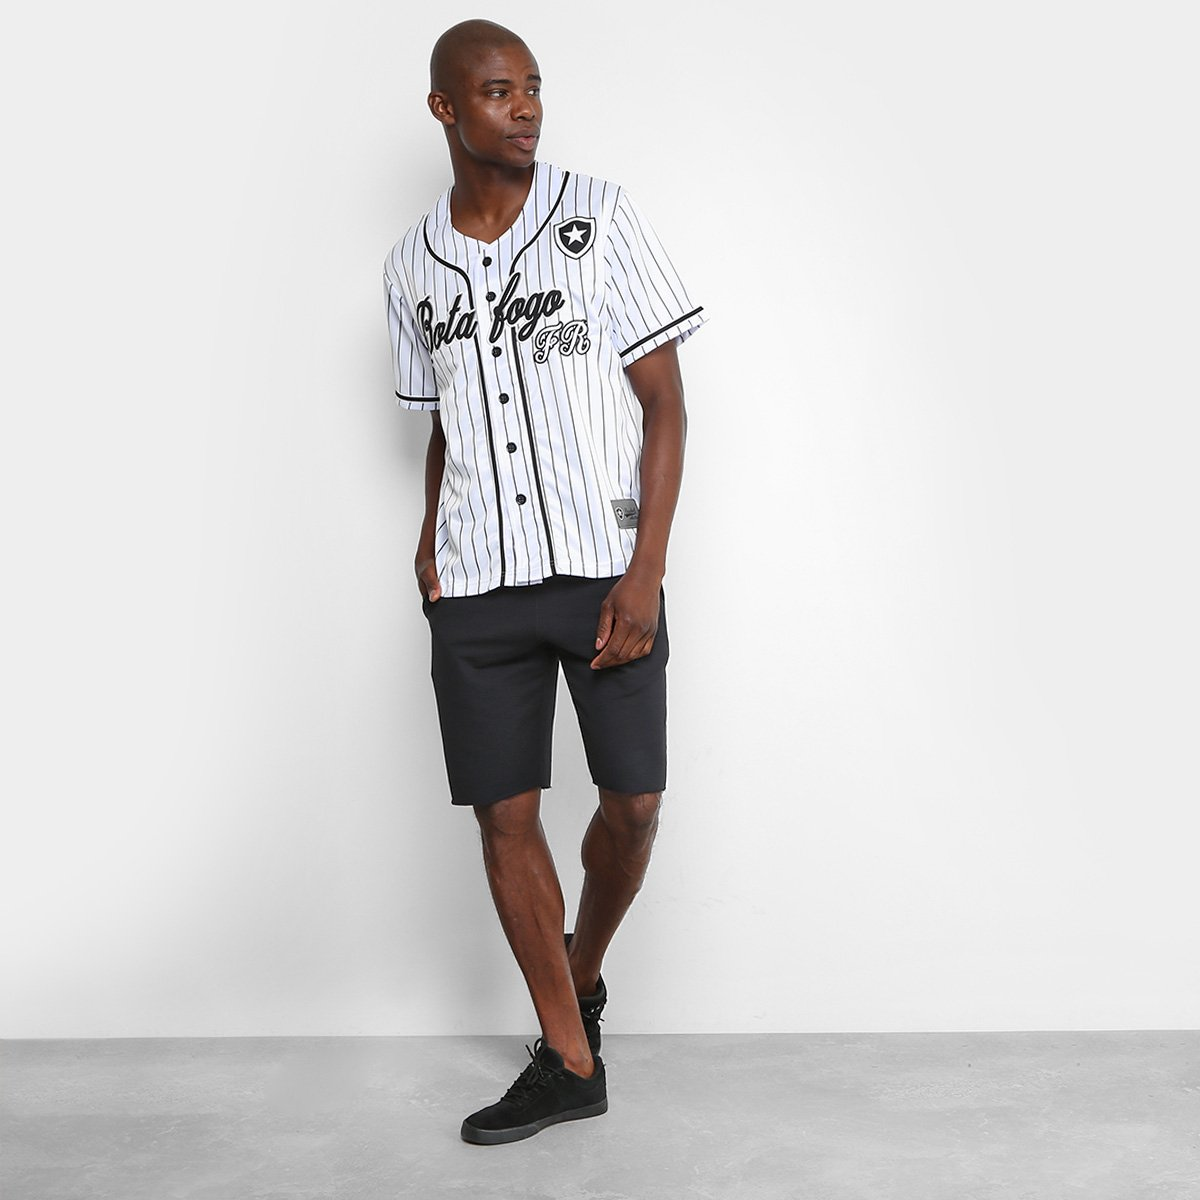 Camisa Botafogo Baseball Masculina - Branco e Preto - Compre Agora ... e9d9be33b4fd8